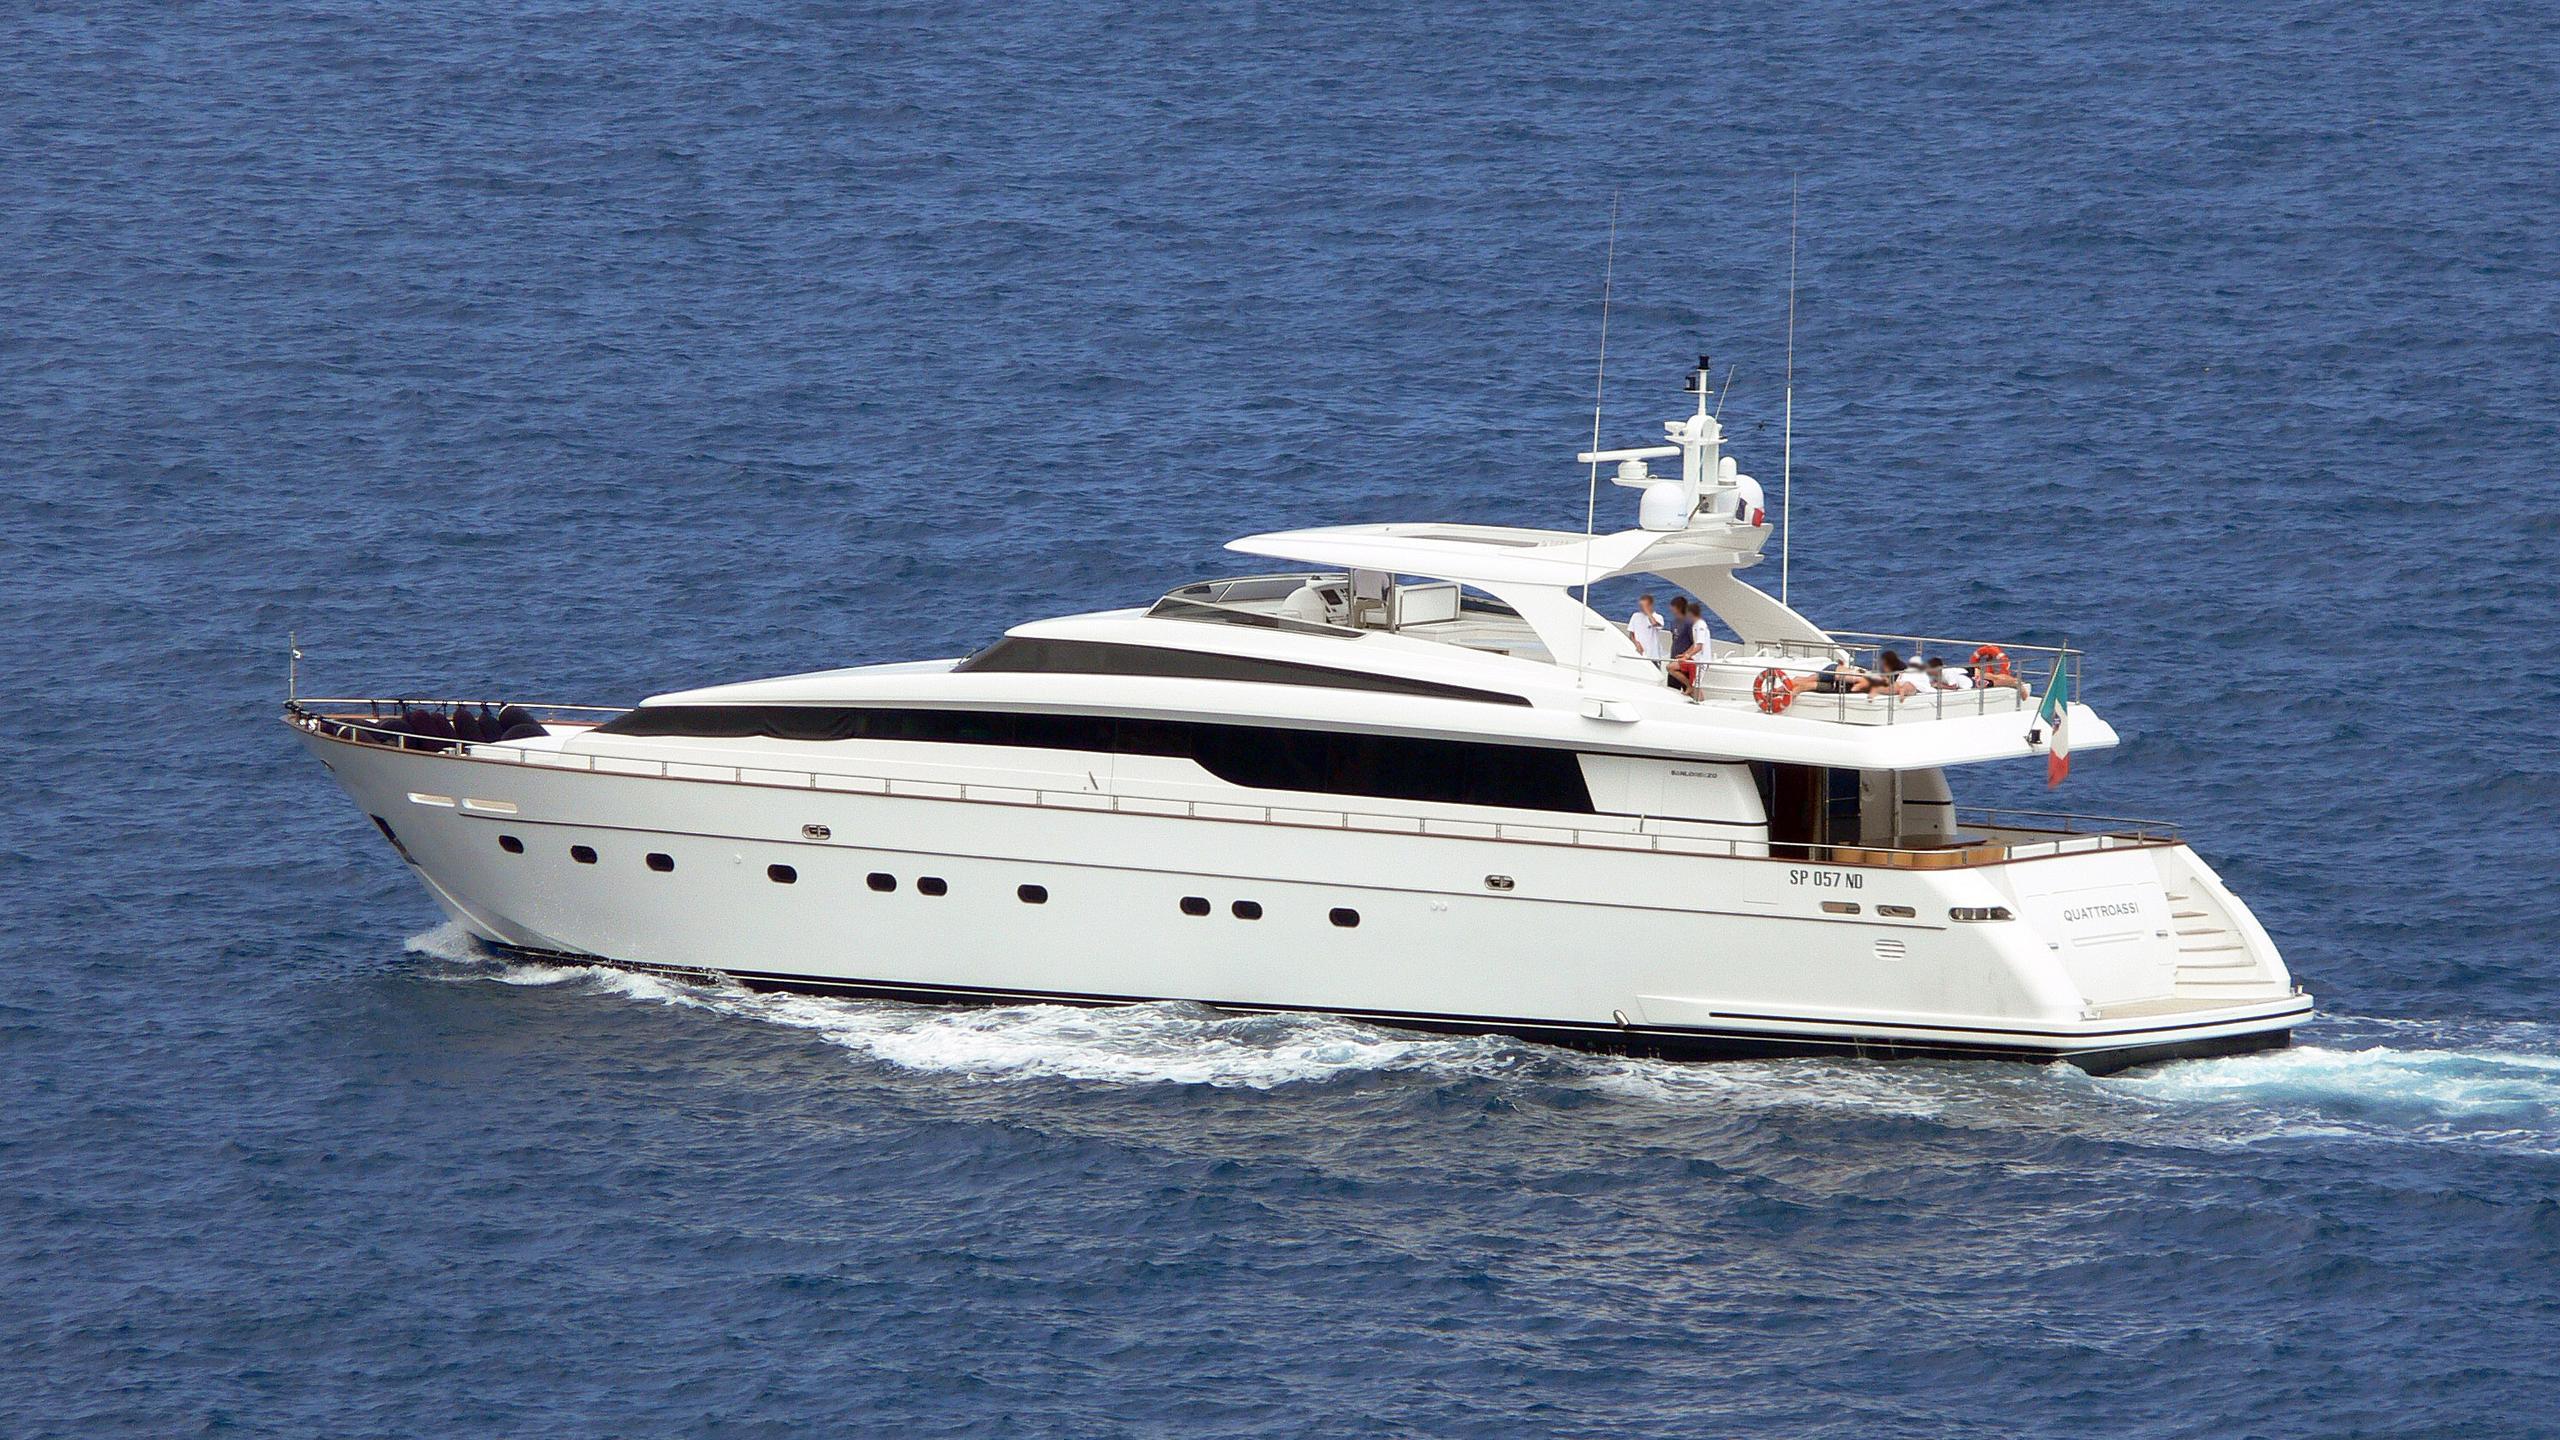 dester-motor-yacht-sanlorenzo-sl-108-2006-33m-cruising-stern